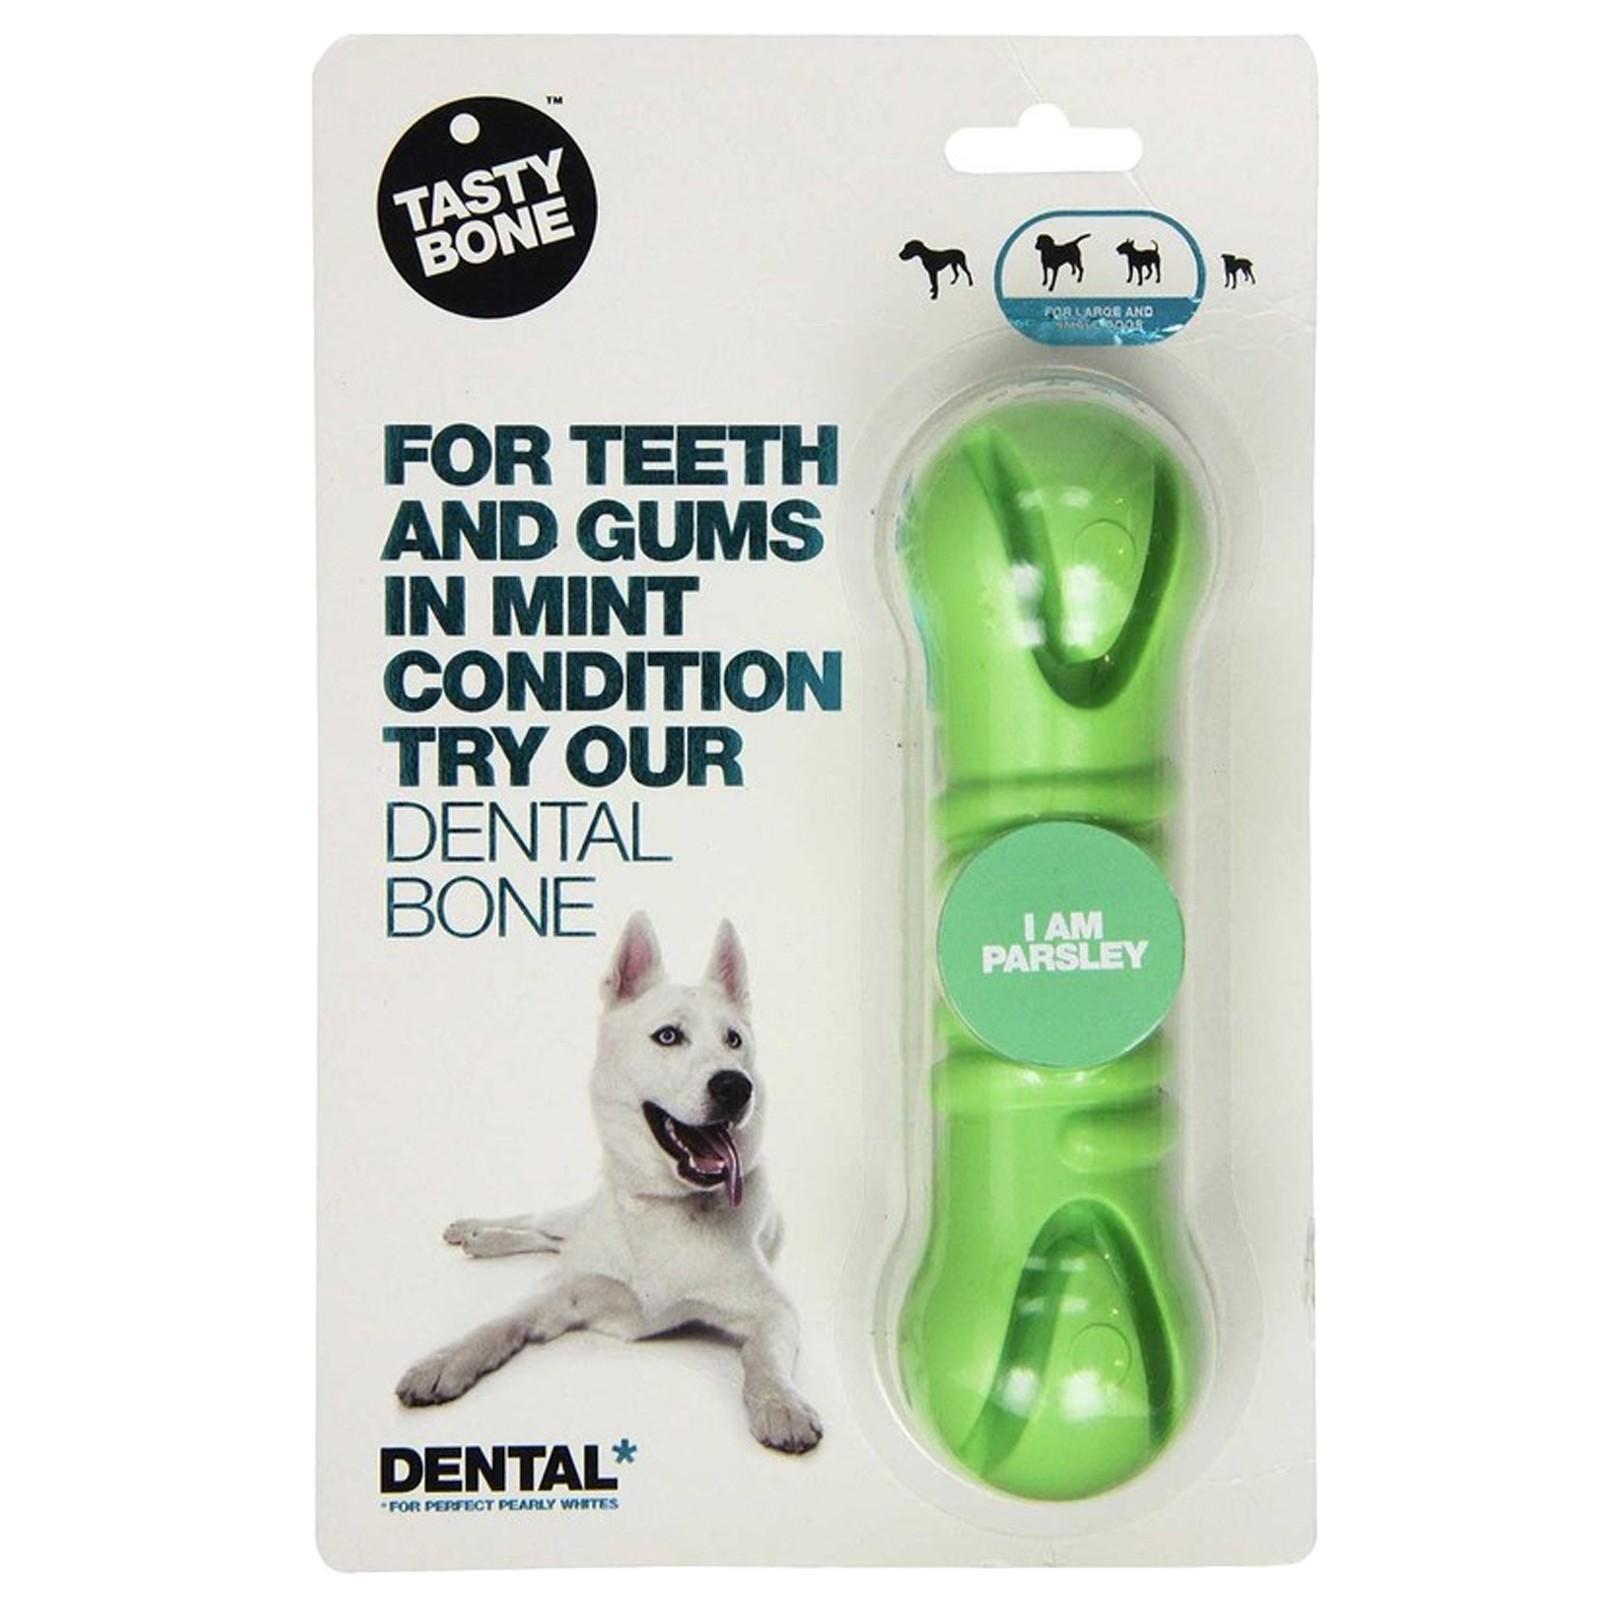 Tasty Bone Nylon Dental Bone for Medium to Large Dogs - Parsley